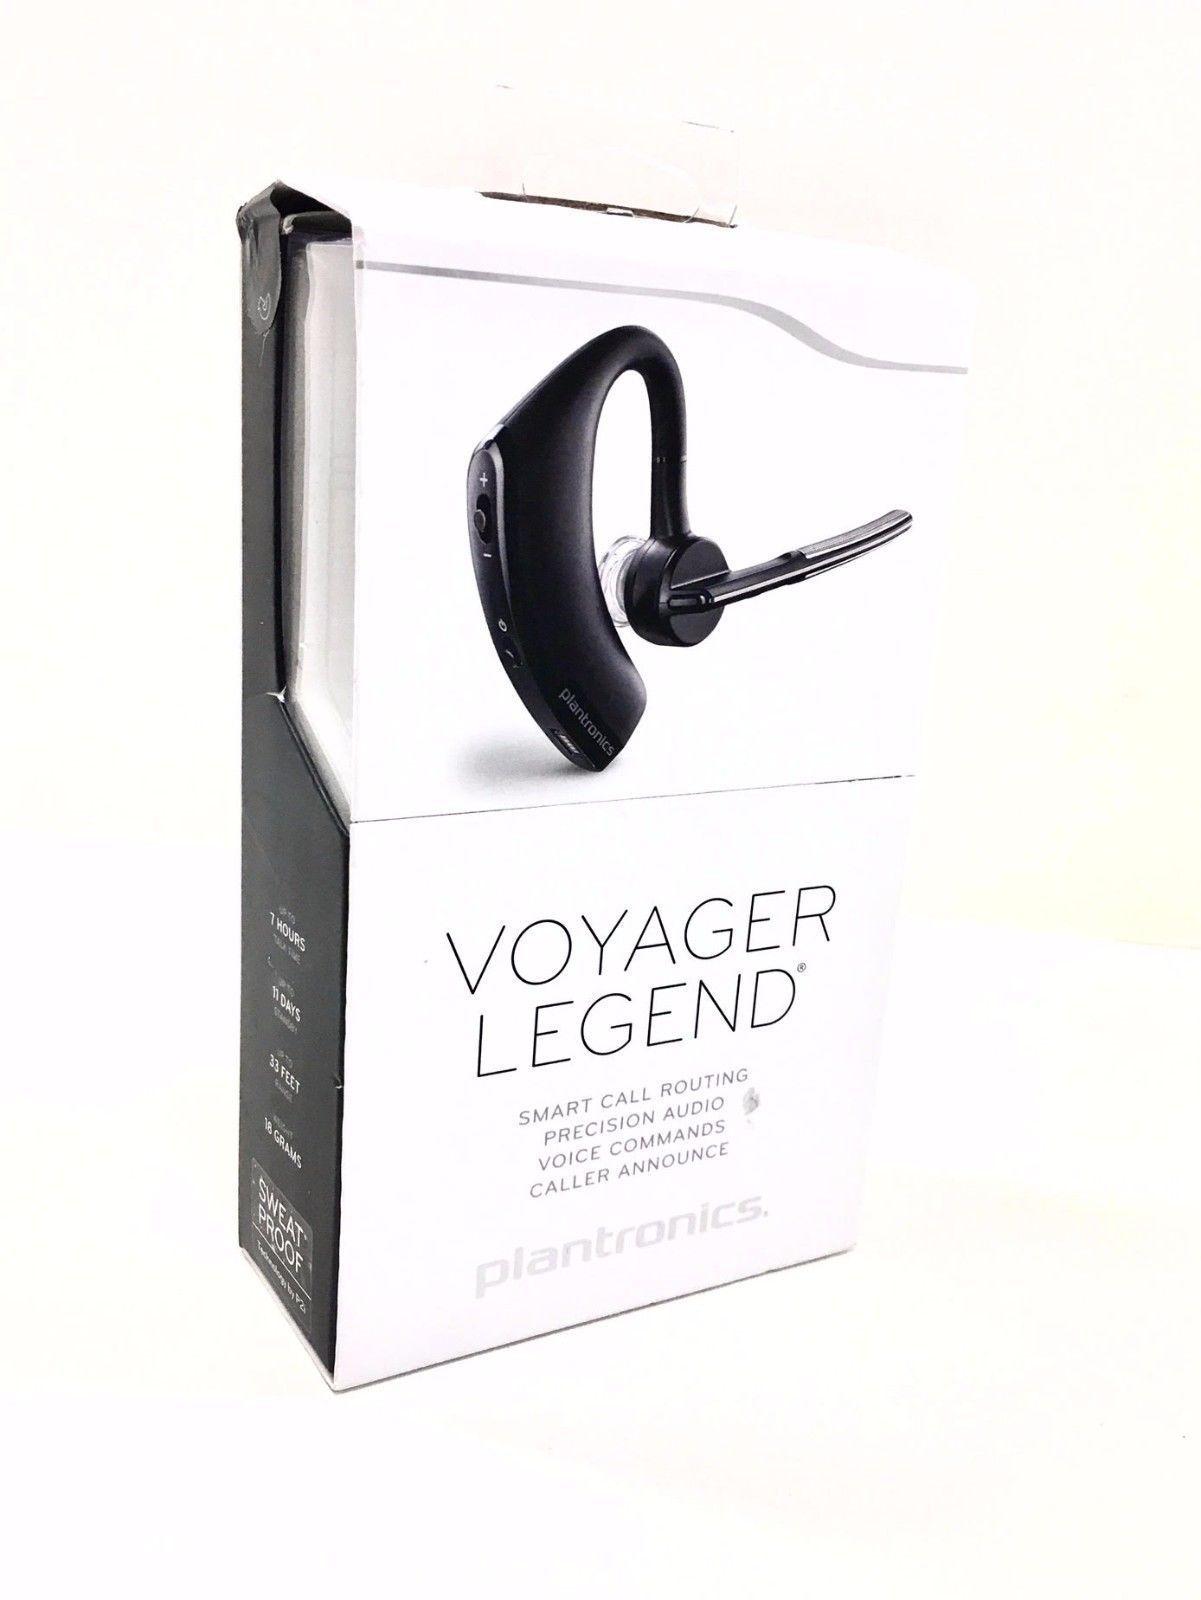 Nice Plantronics Voyager Legend Bluetooth Headset W Voice Command Black Retail Plantronics Bluetooth Headset Legend